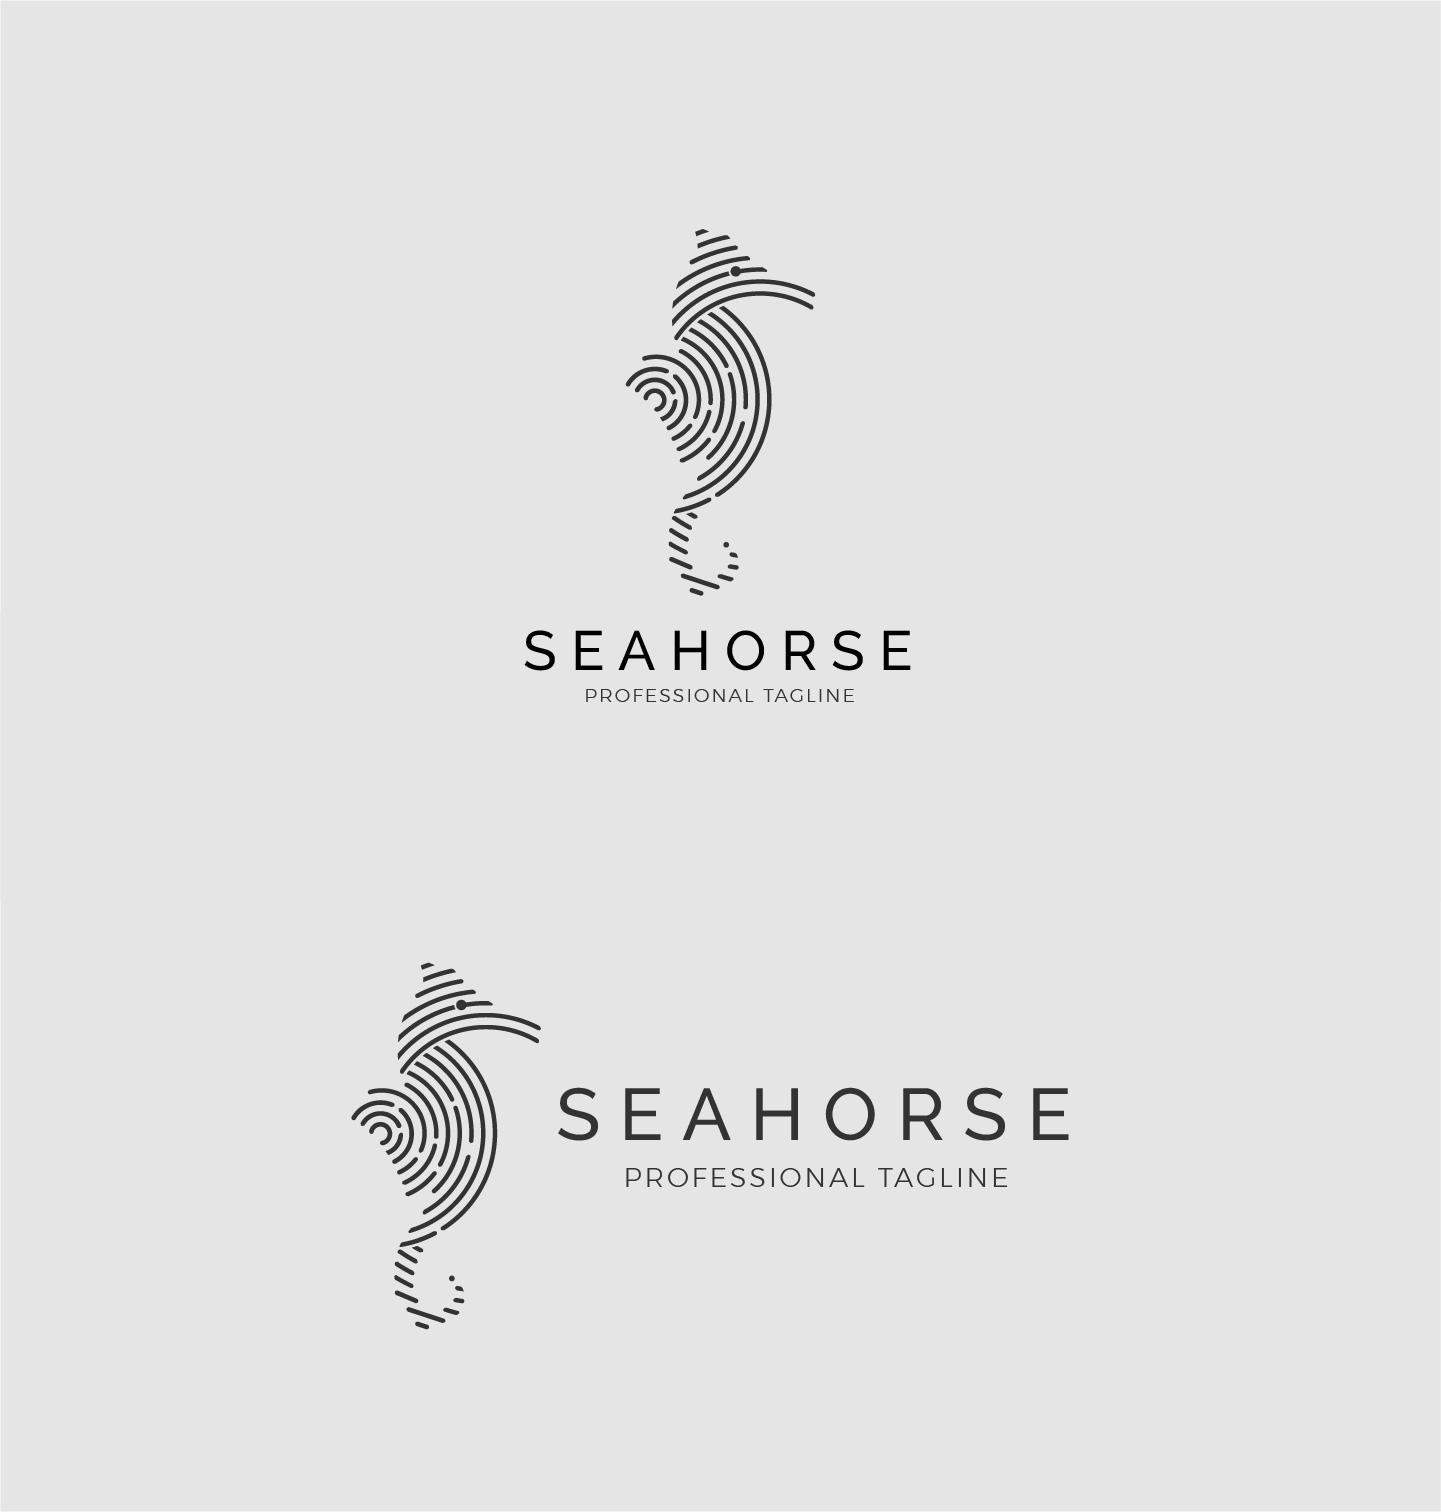 Animal Sea Logo - Seahorse Logo example image 3